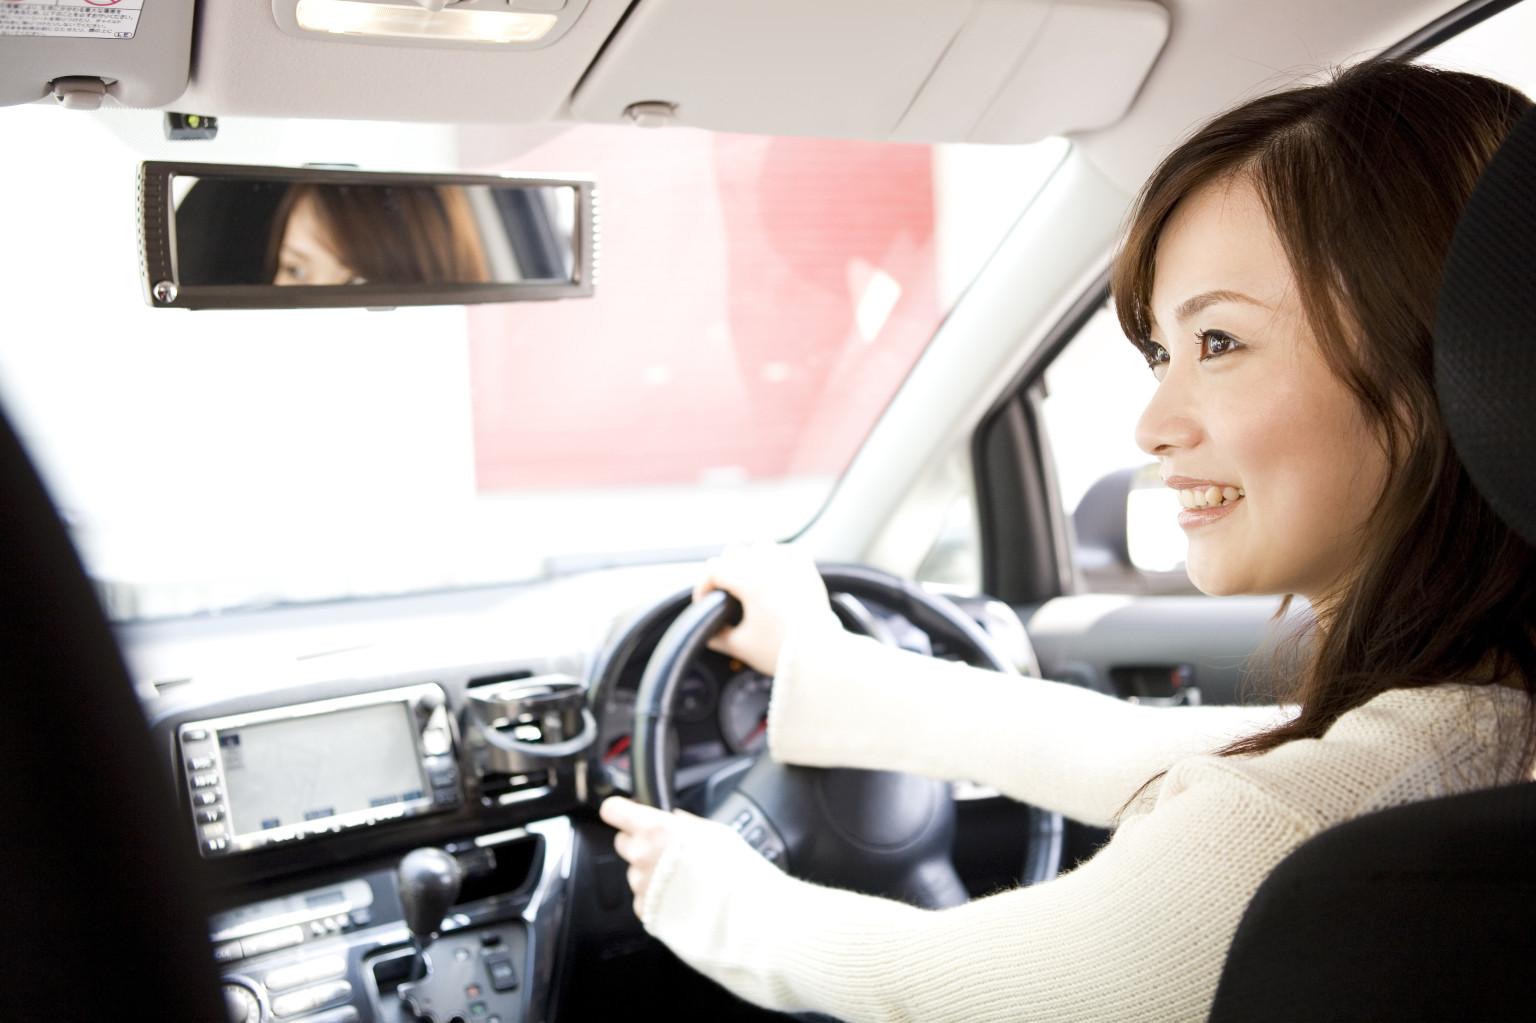 Making roads safer by defensive driving - Rosebank Killarney Gazette